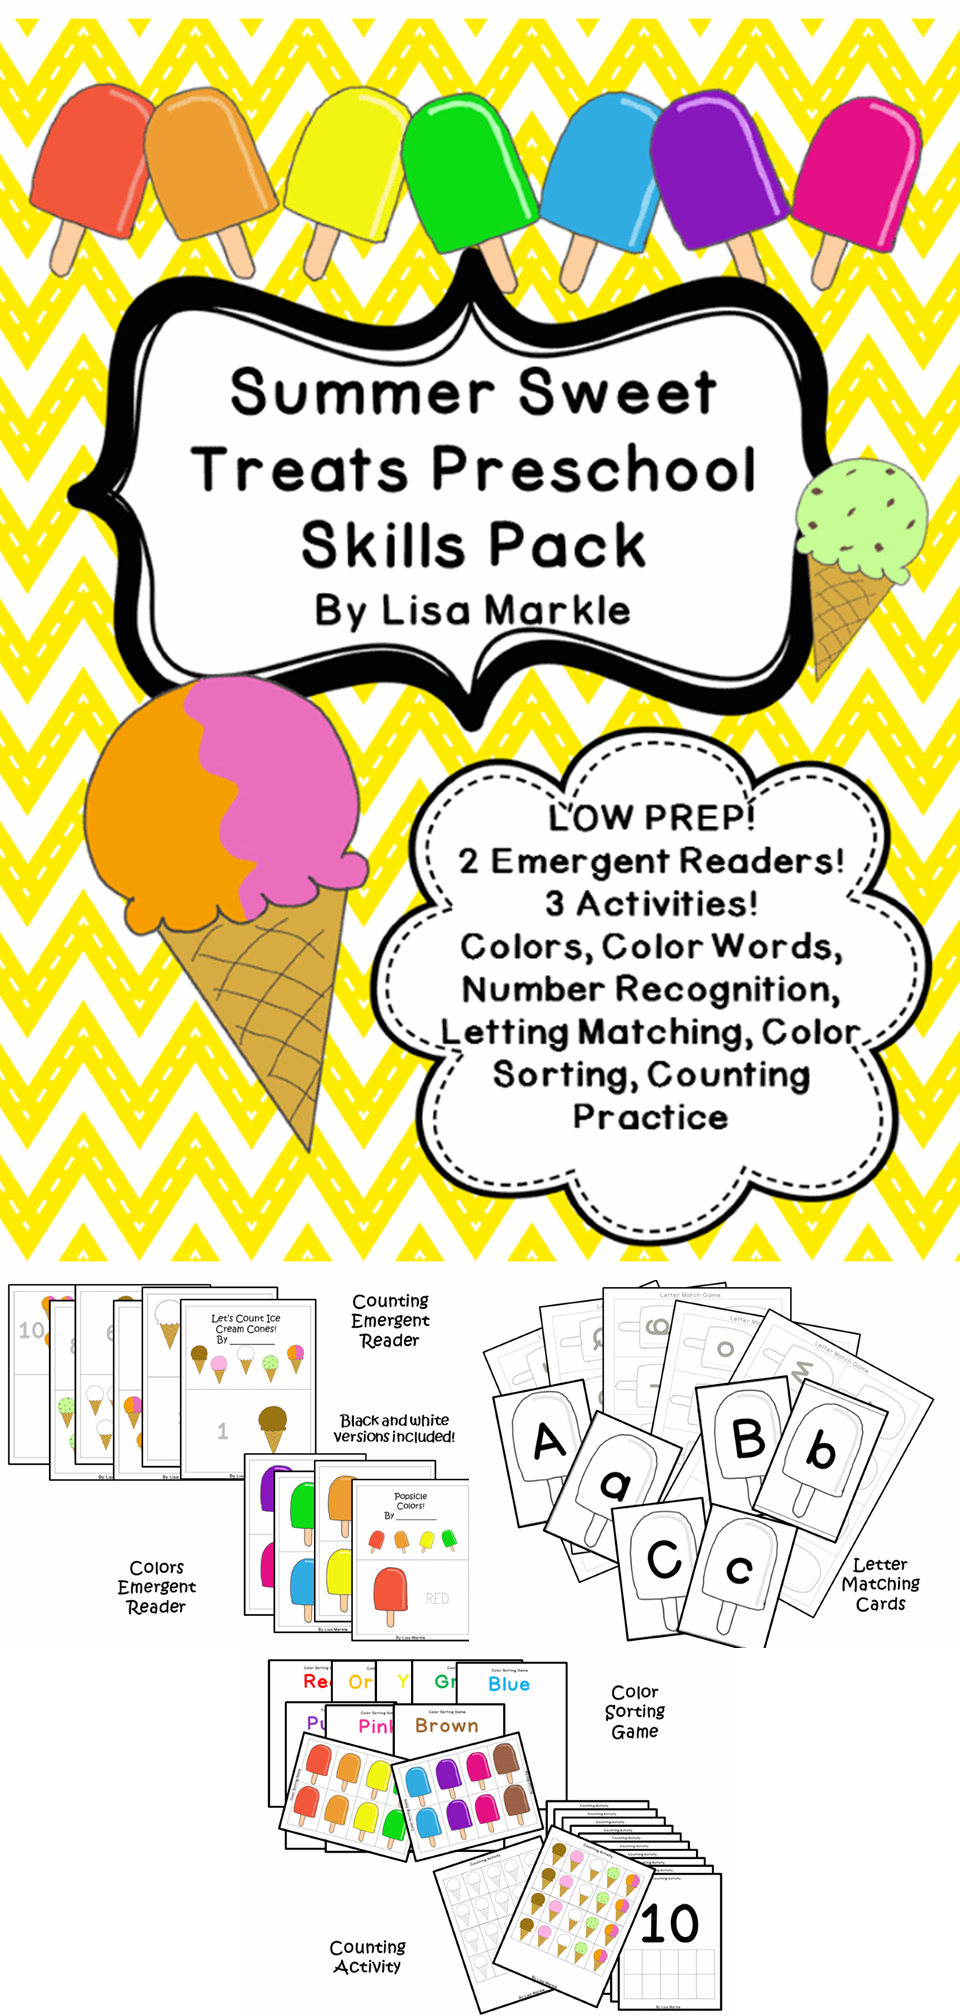 Summer Sweet Treats Preschool Math And Literacy Skills Pinterest